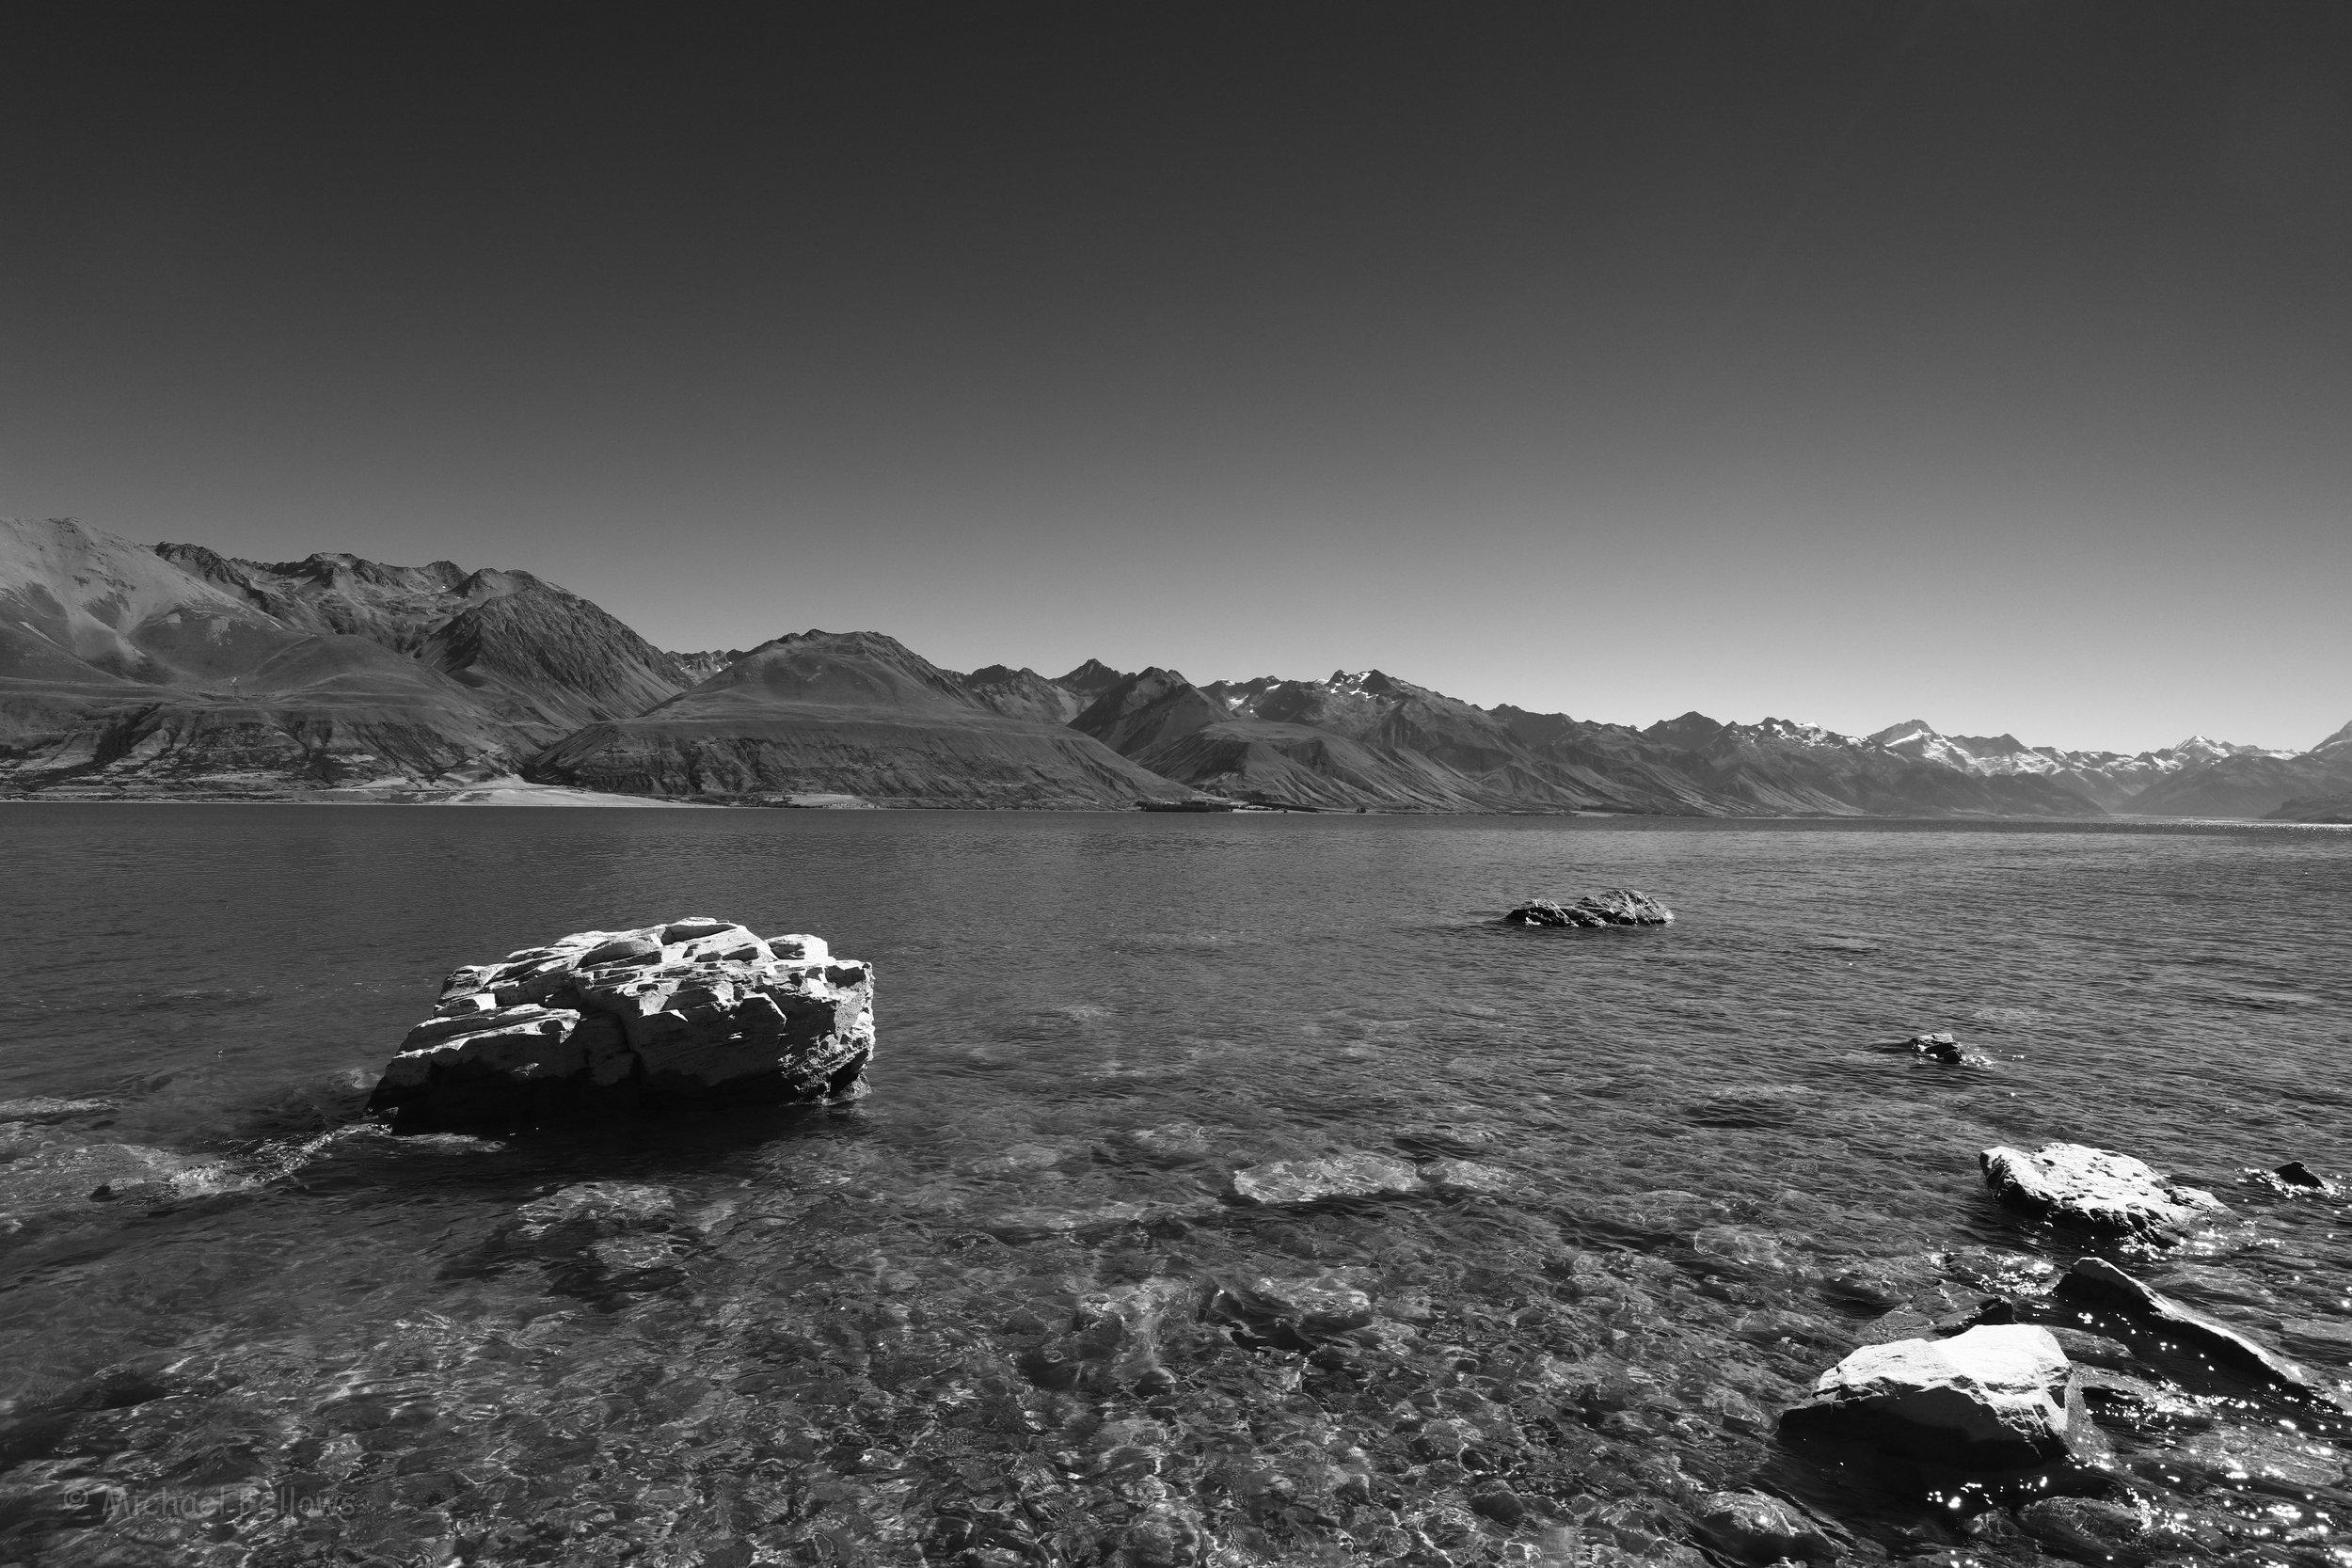 Lake Pukaki from the eastern shore